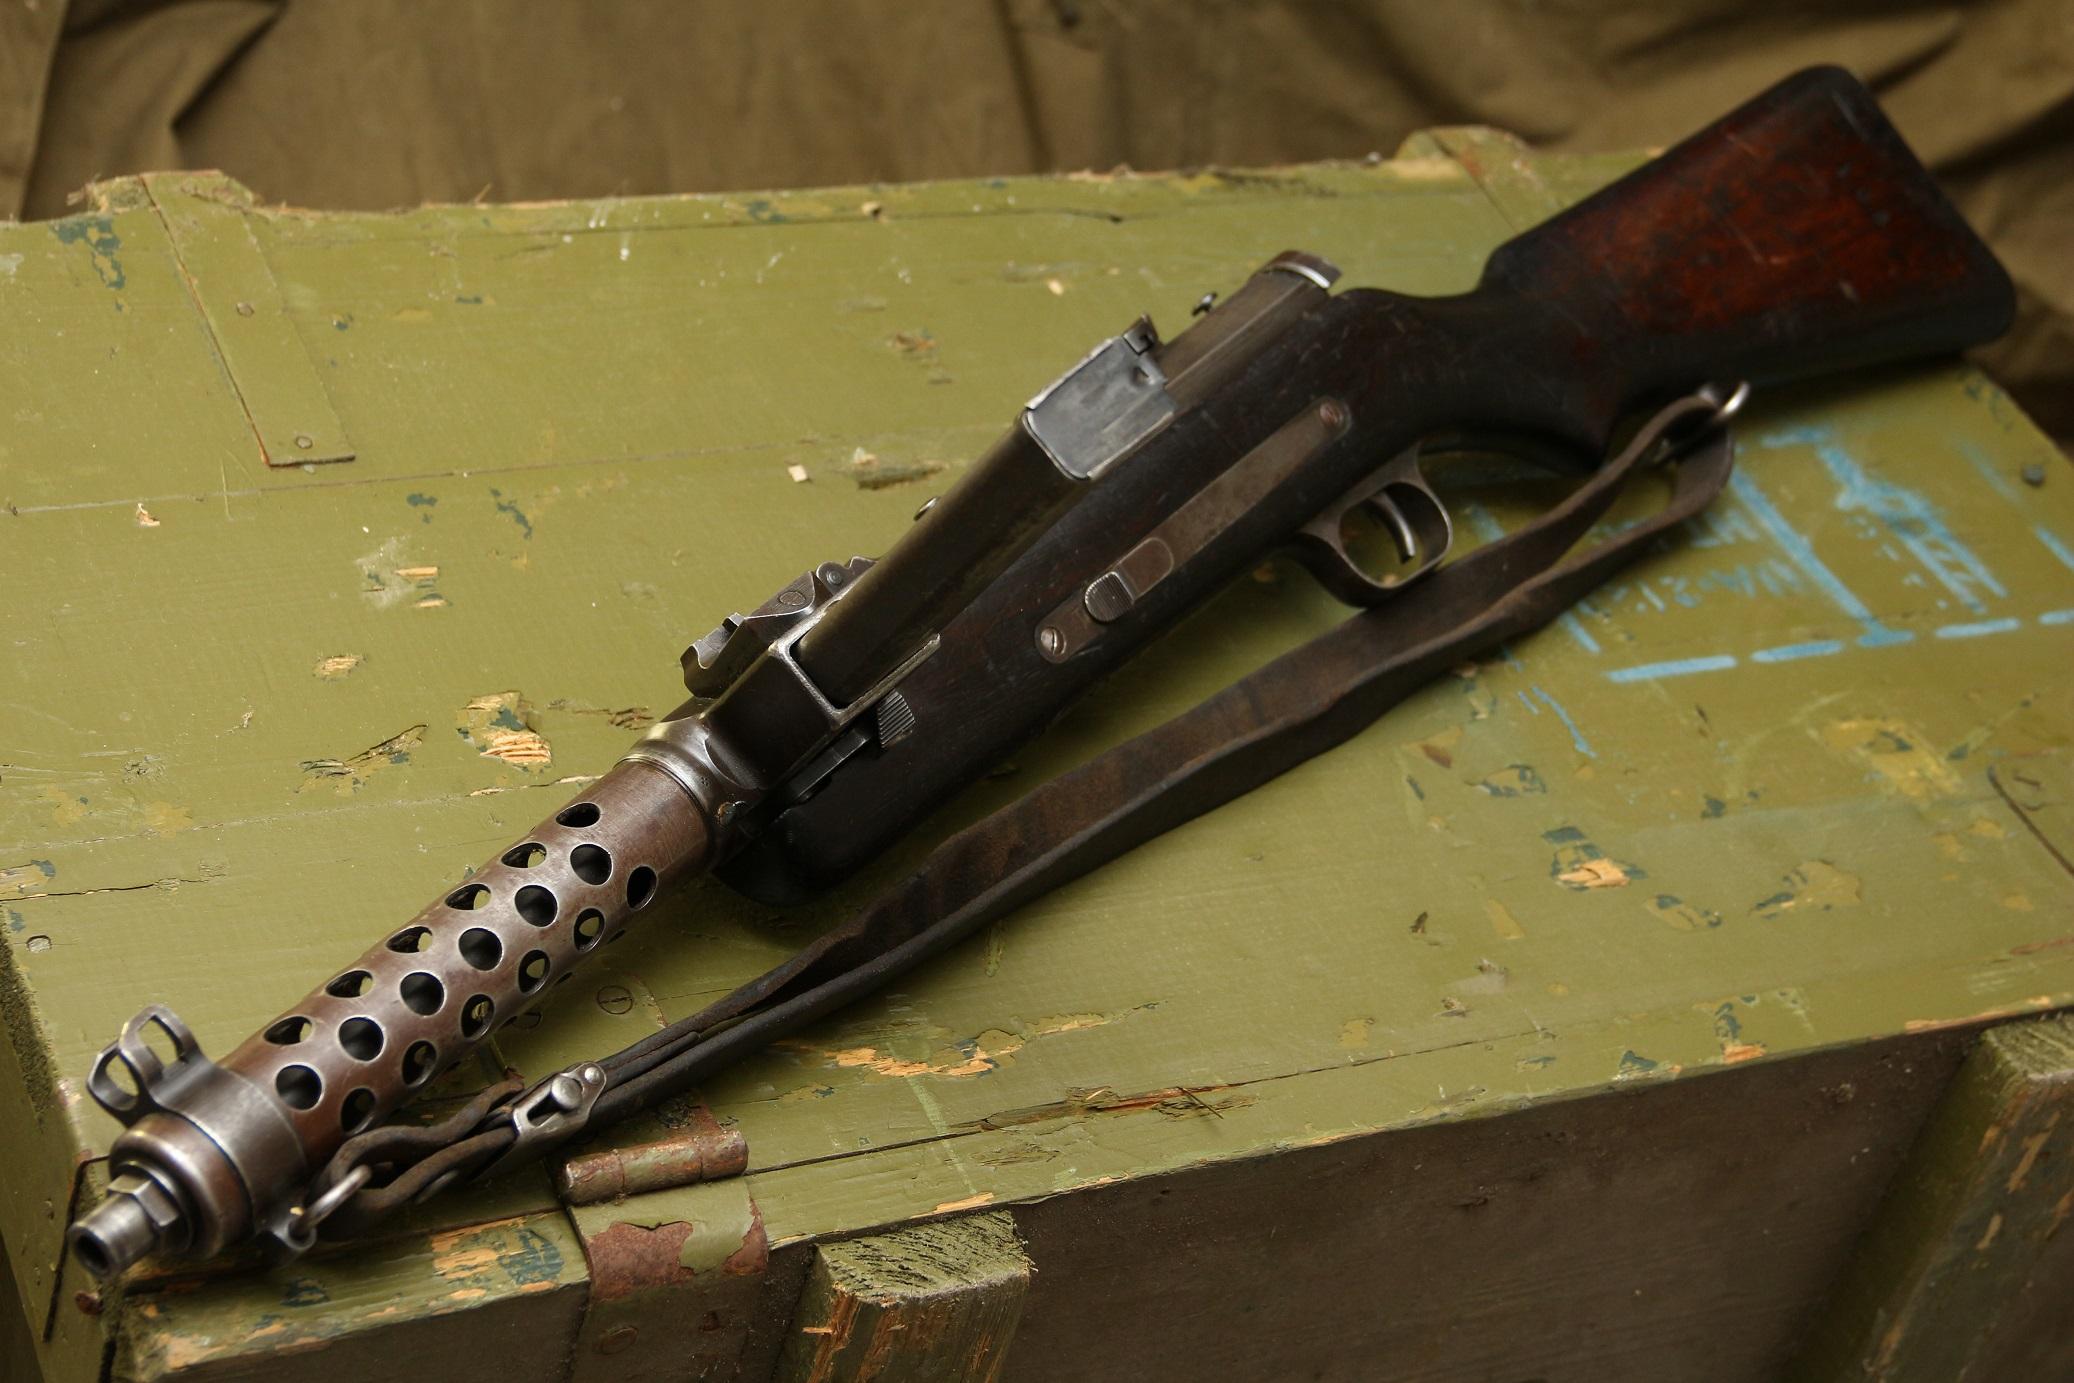 Пистолет-пулемет Steyr-Solothurn S1-100 / MP34 #901, 1942 год, немецкая военная приемка